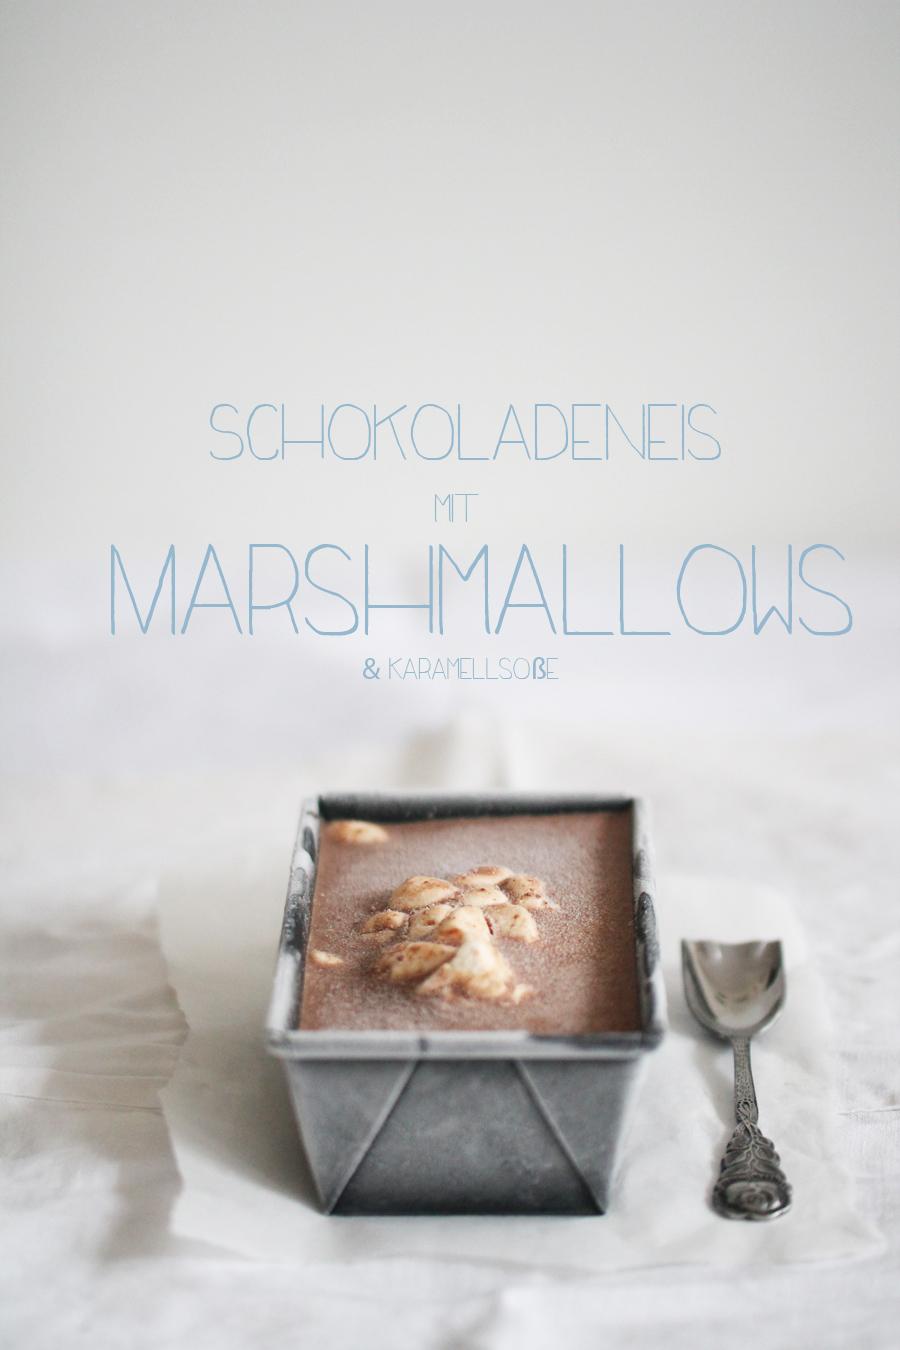 Schokoladeneis mit Marshmallows